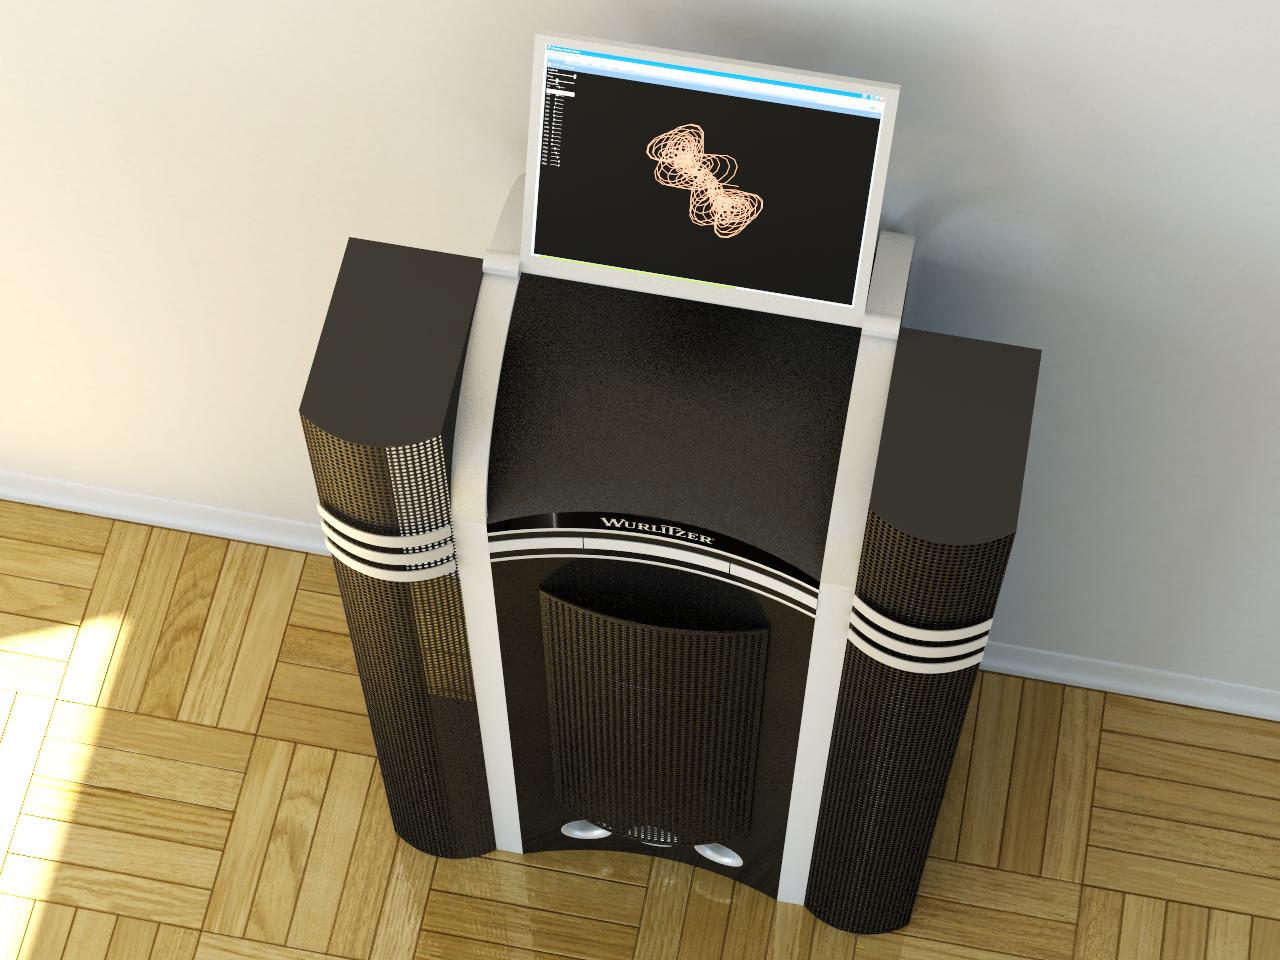 produktdesign f r unterhaltungselektronik projekt audio terminal. Black Bedroom Furniture Sets. Home Design Ideas